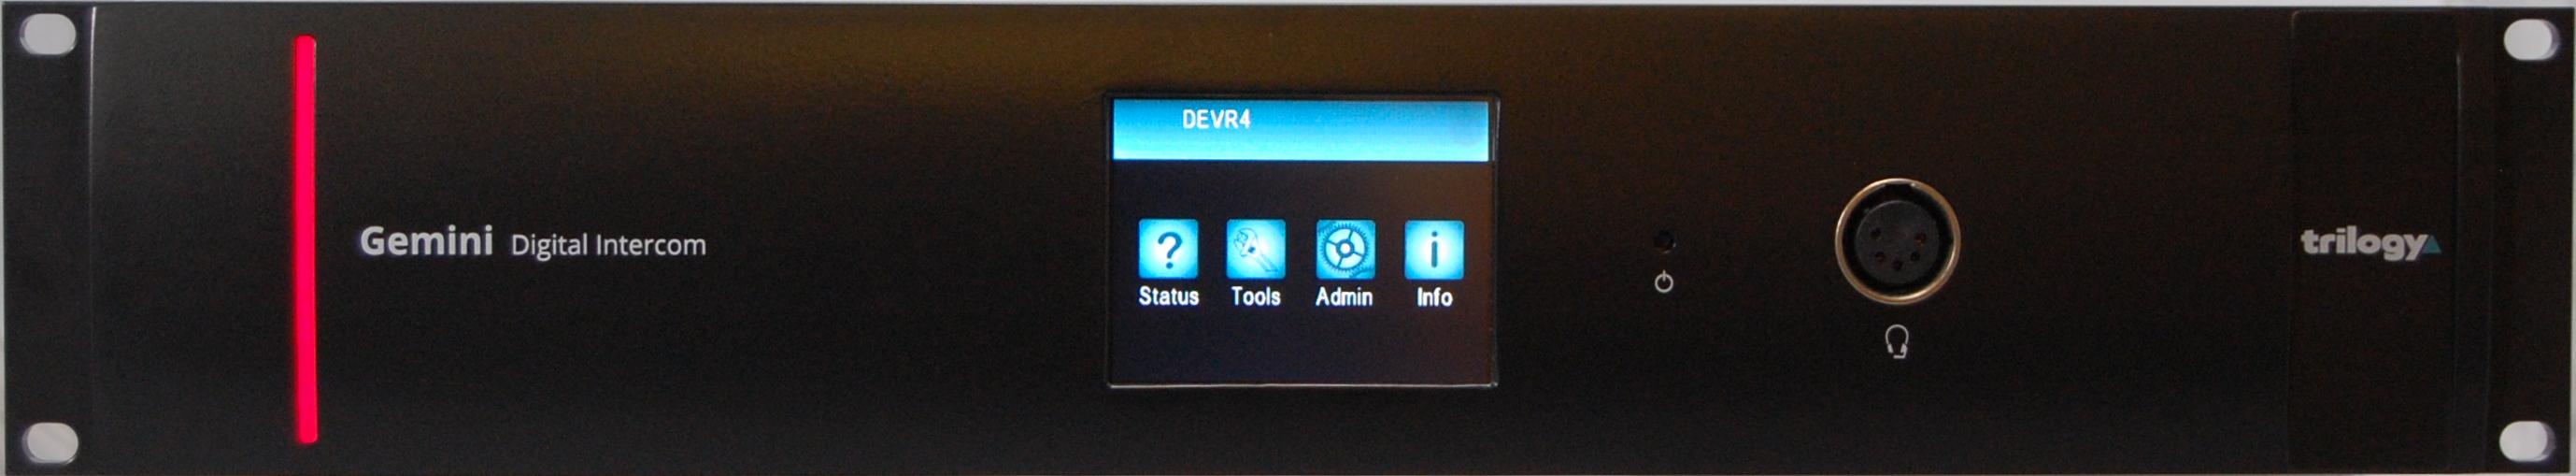 Gemini Trilogy Communications Simple Intercom Circuit For Home Communication Improve